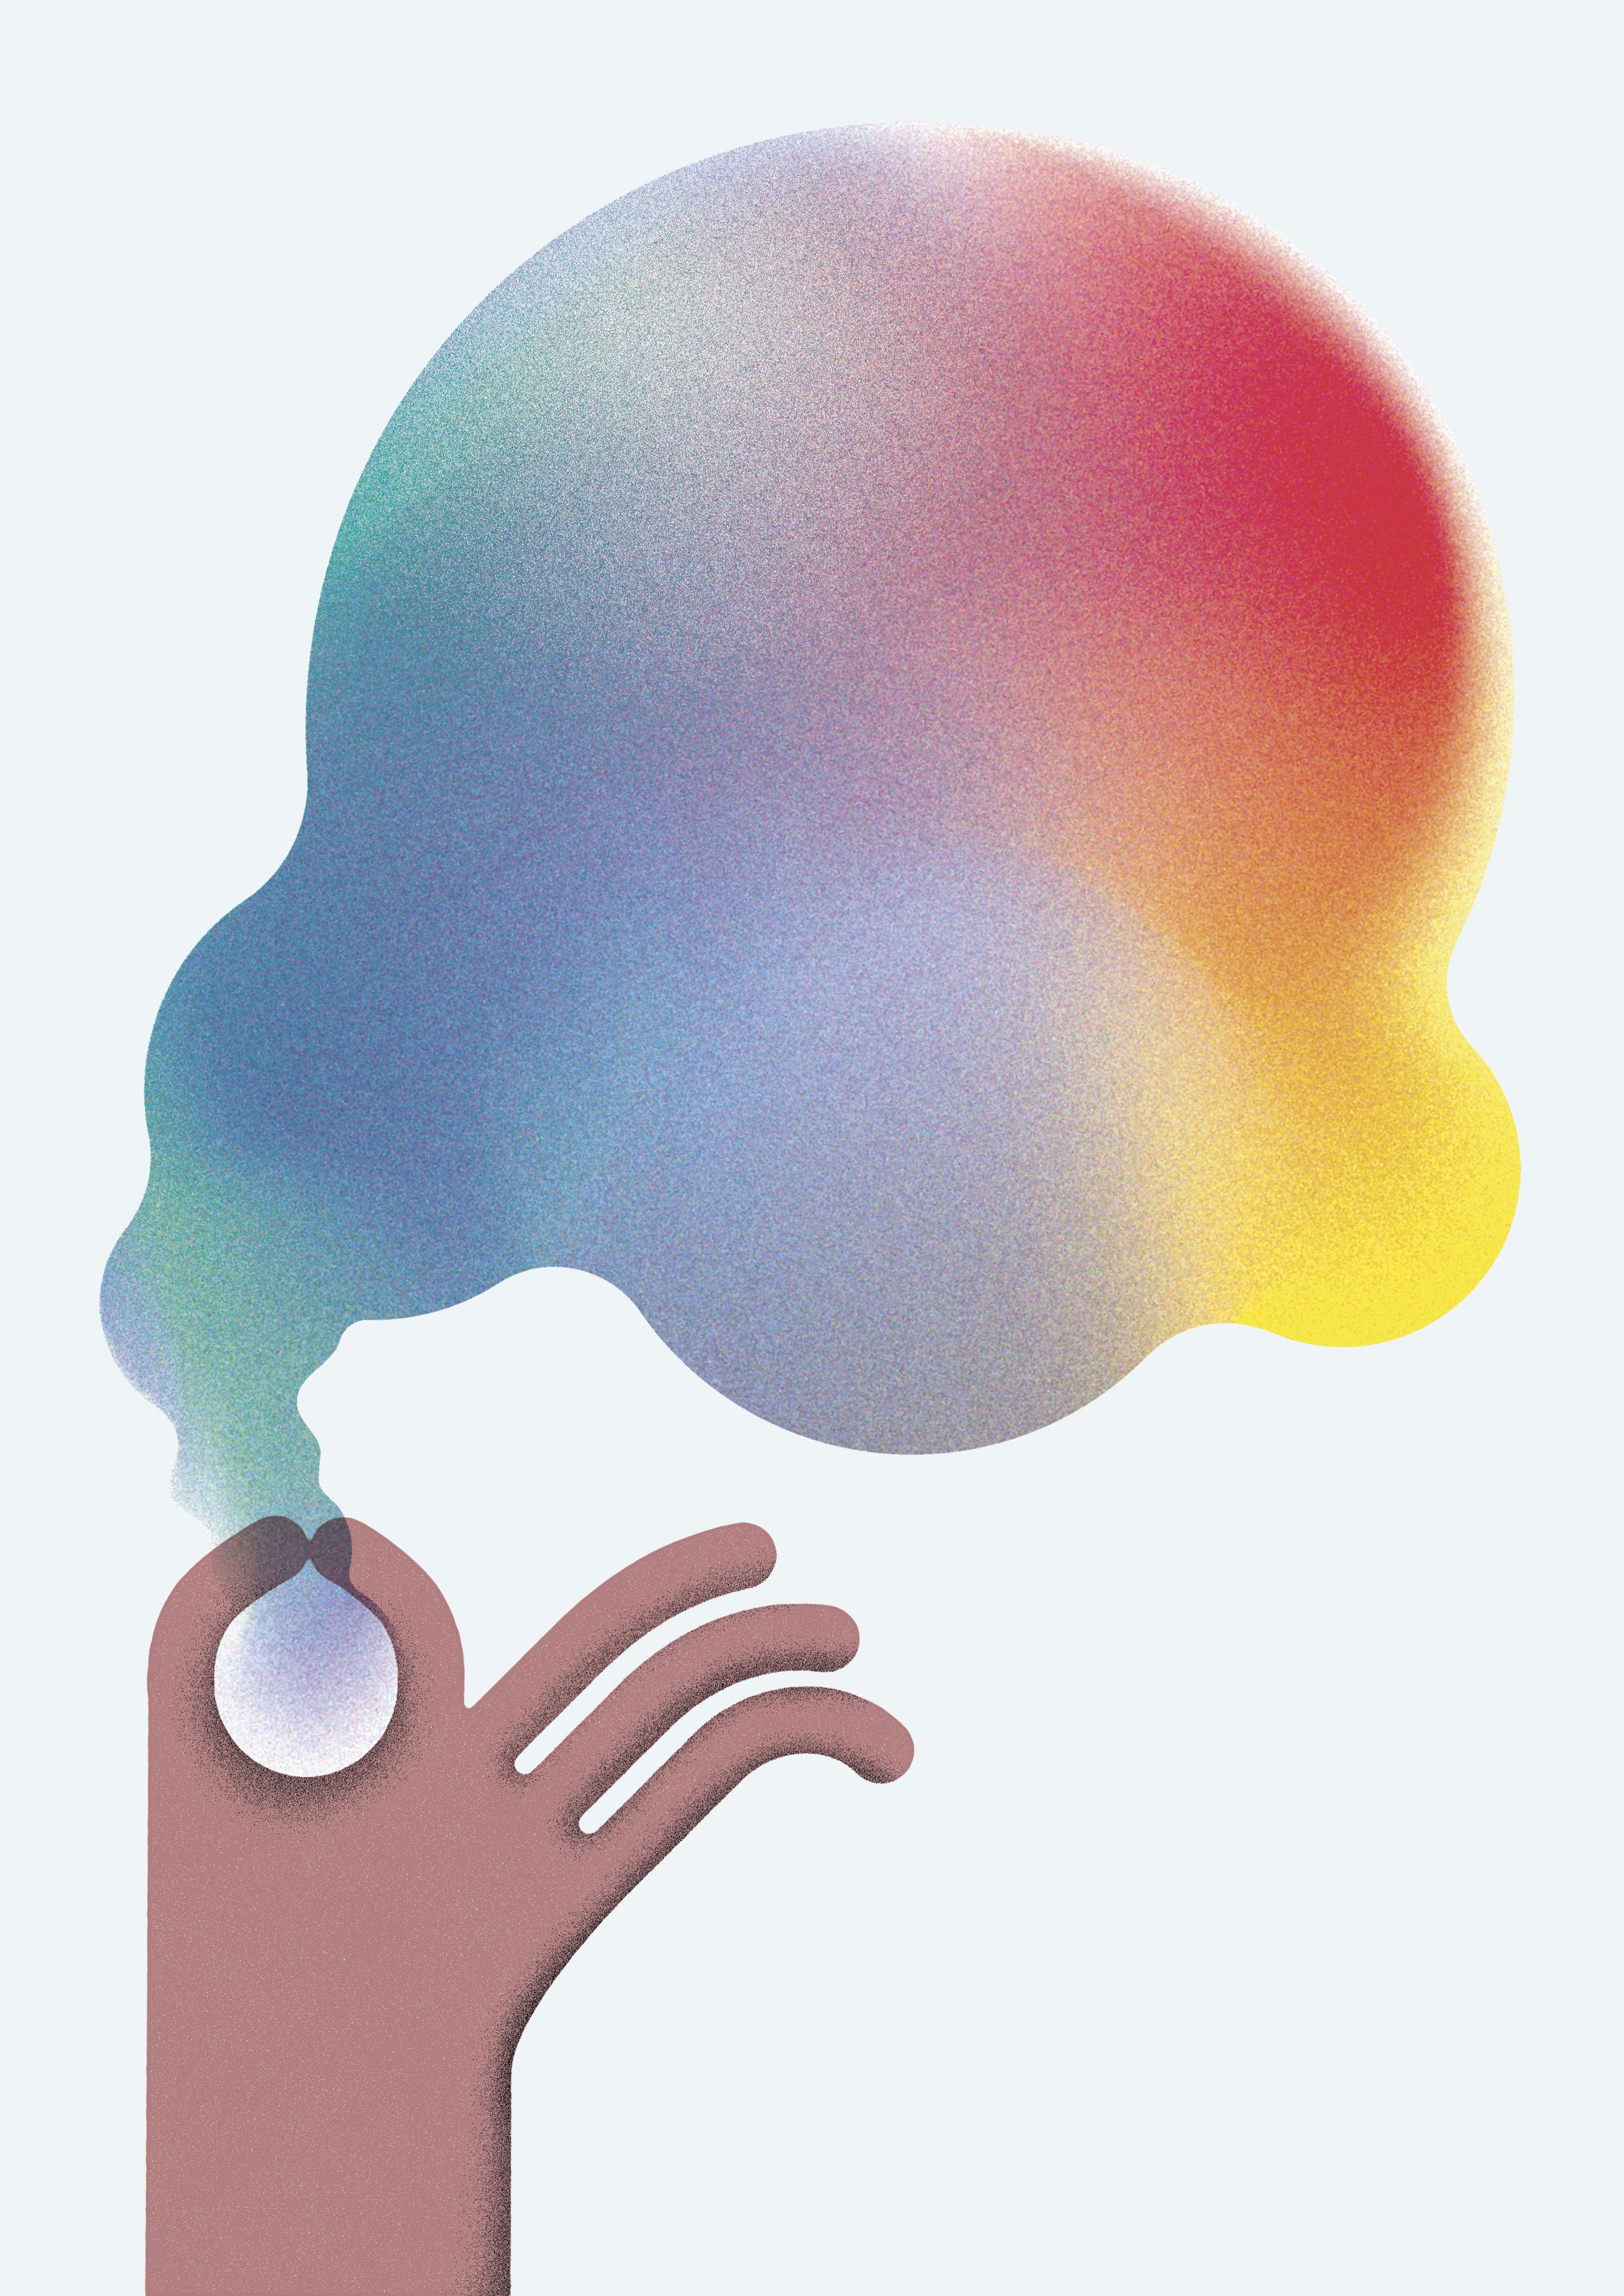 Werbemaßnahme-Seifenblase